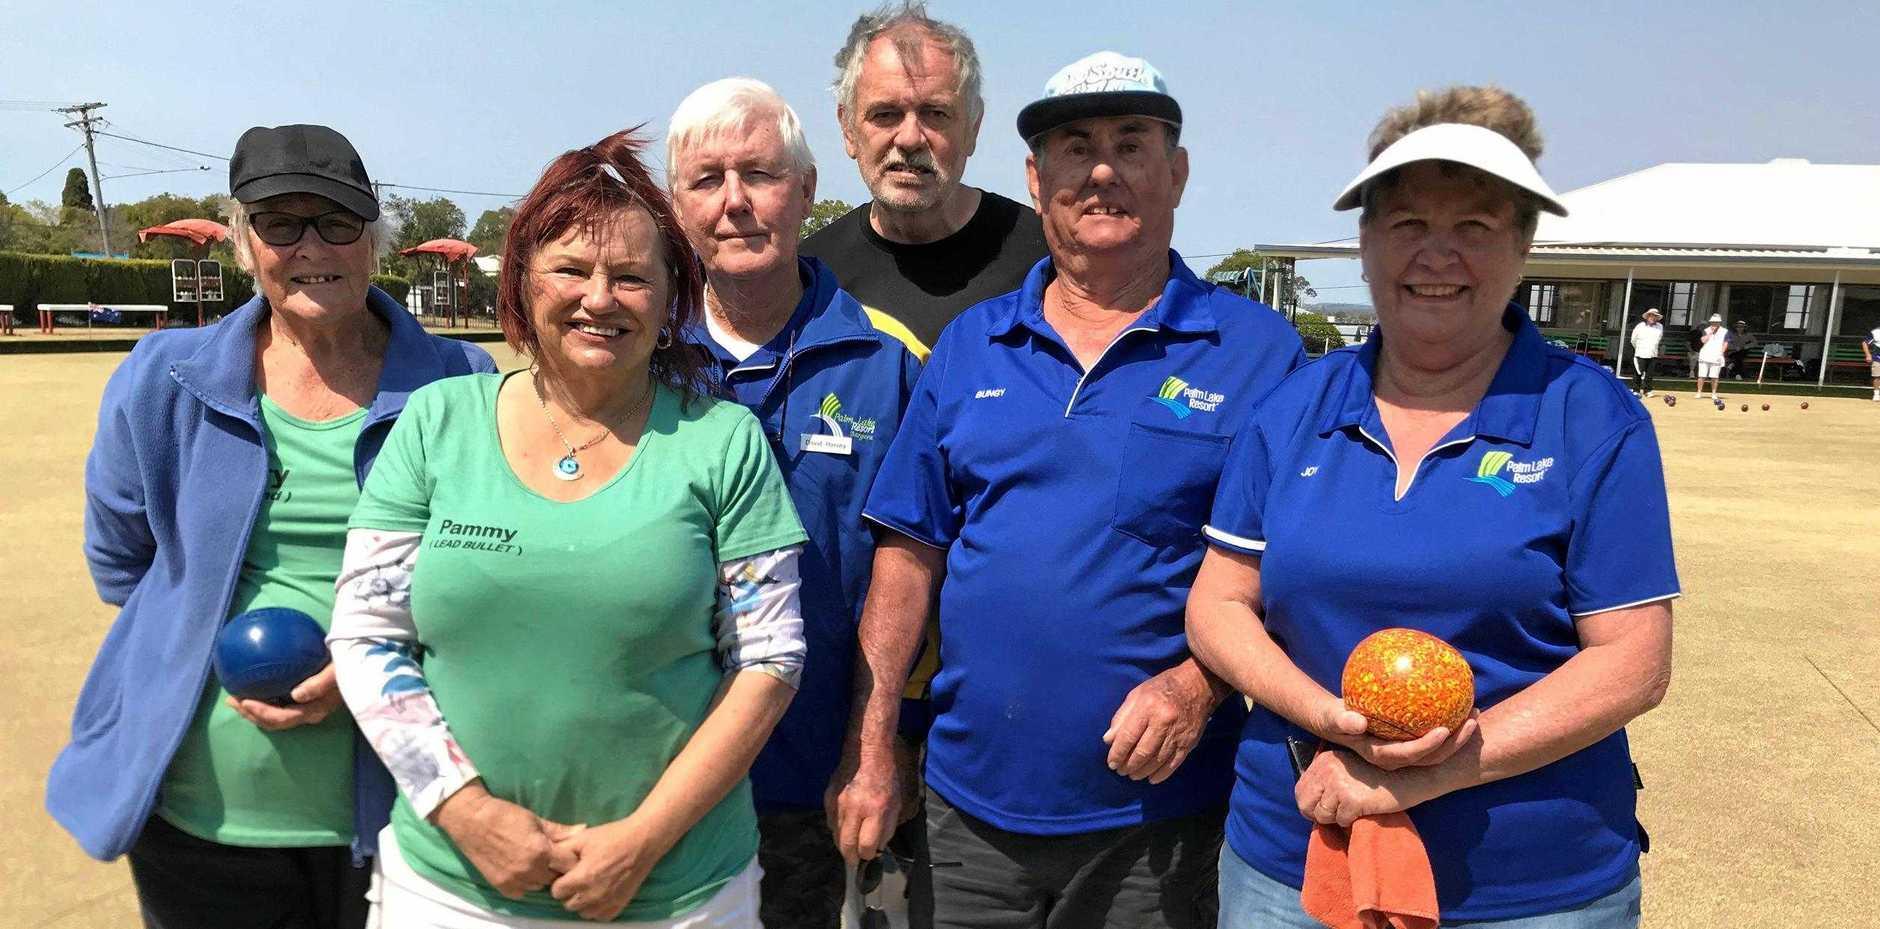 Mary Galloway, Pam Walker, David Harvey, Angus Walker, Bungy and Joy Williams on the green.